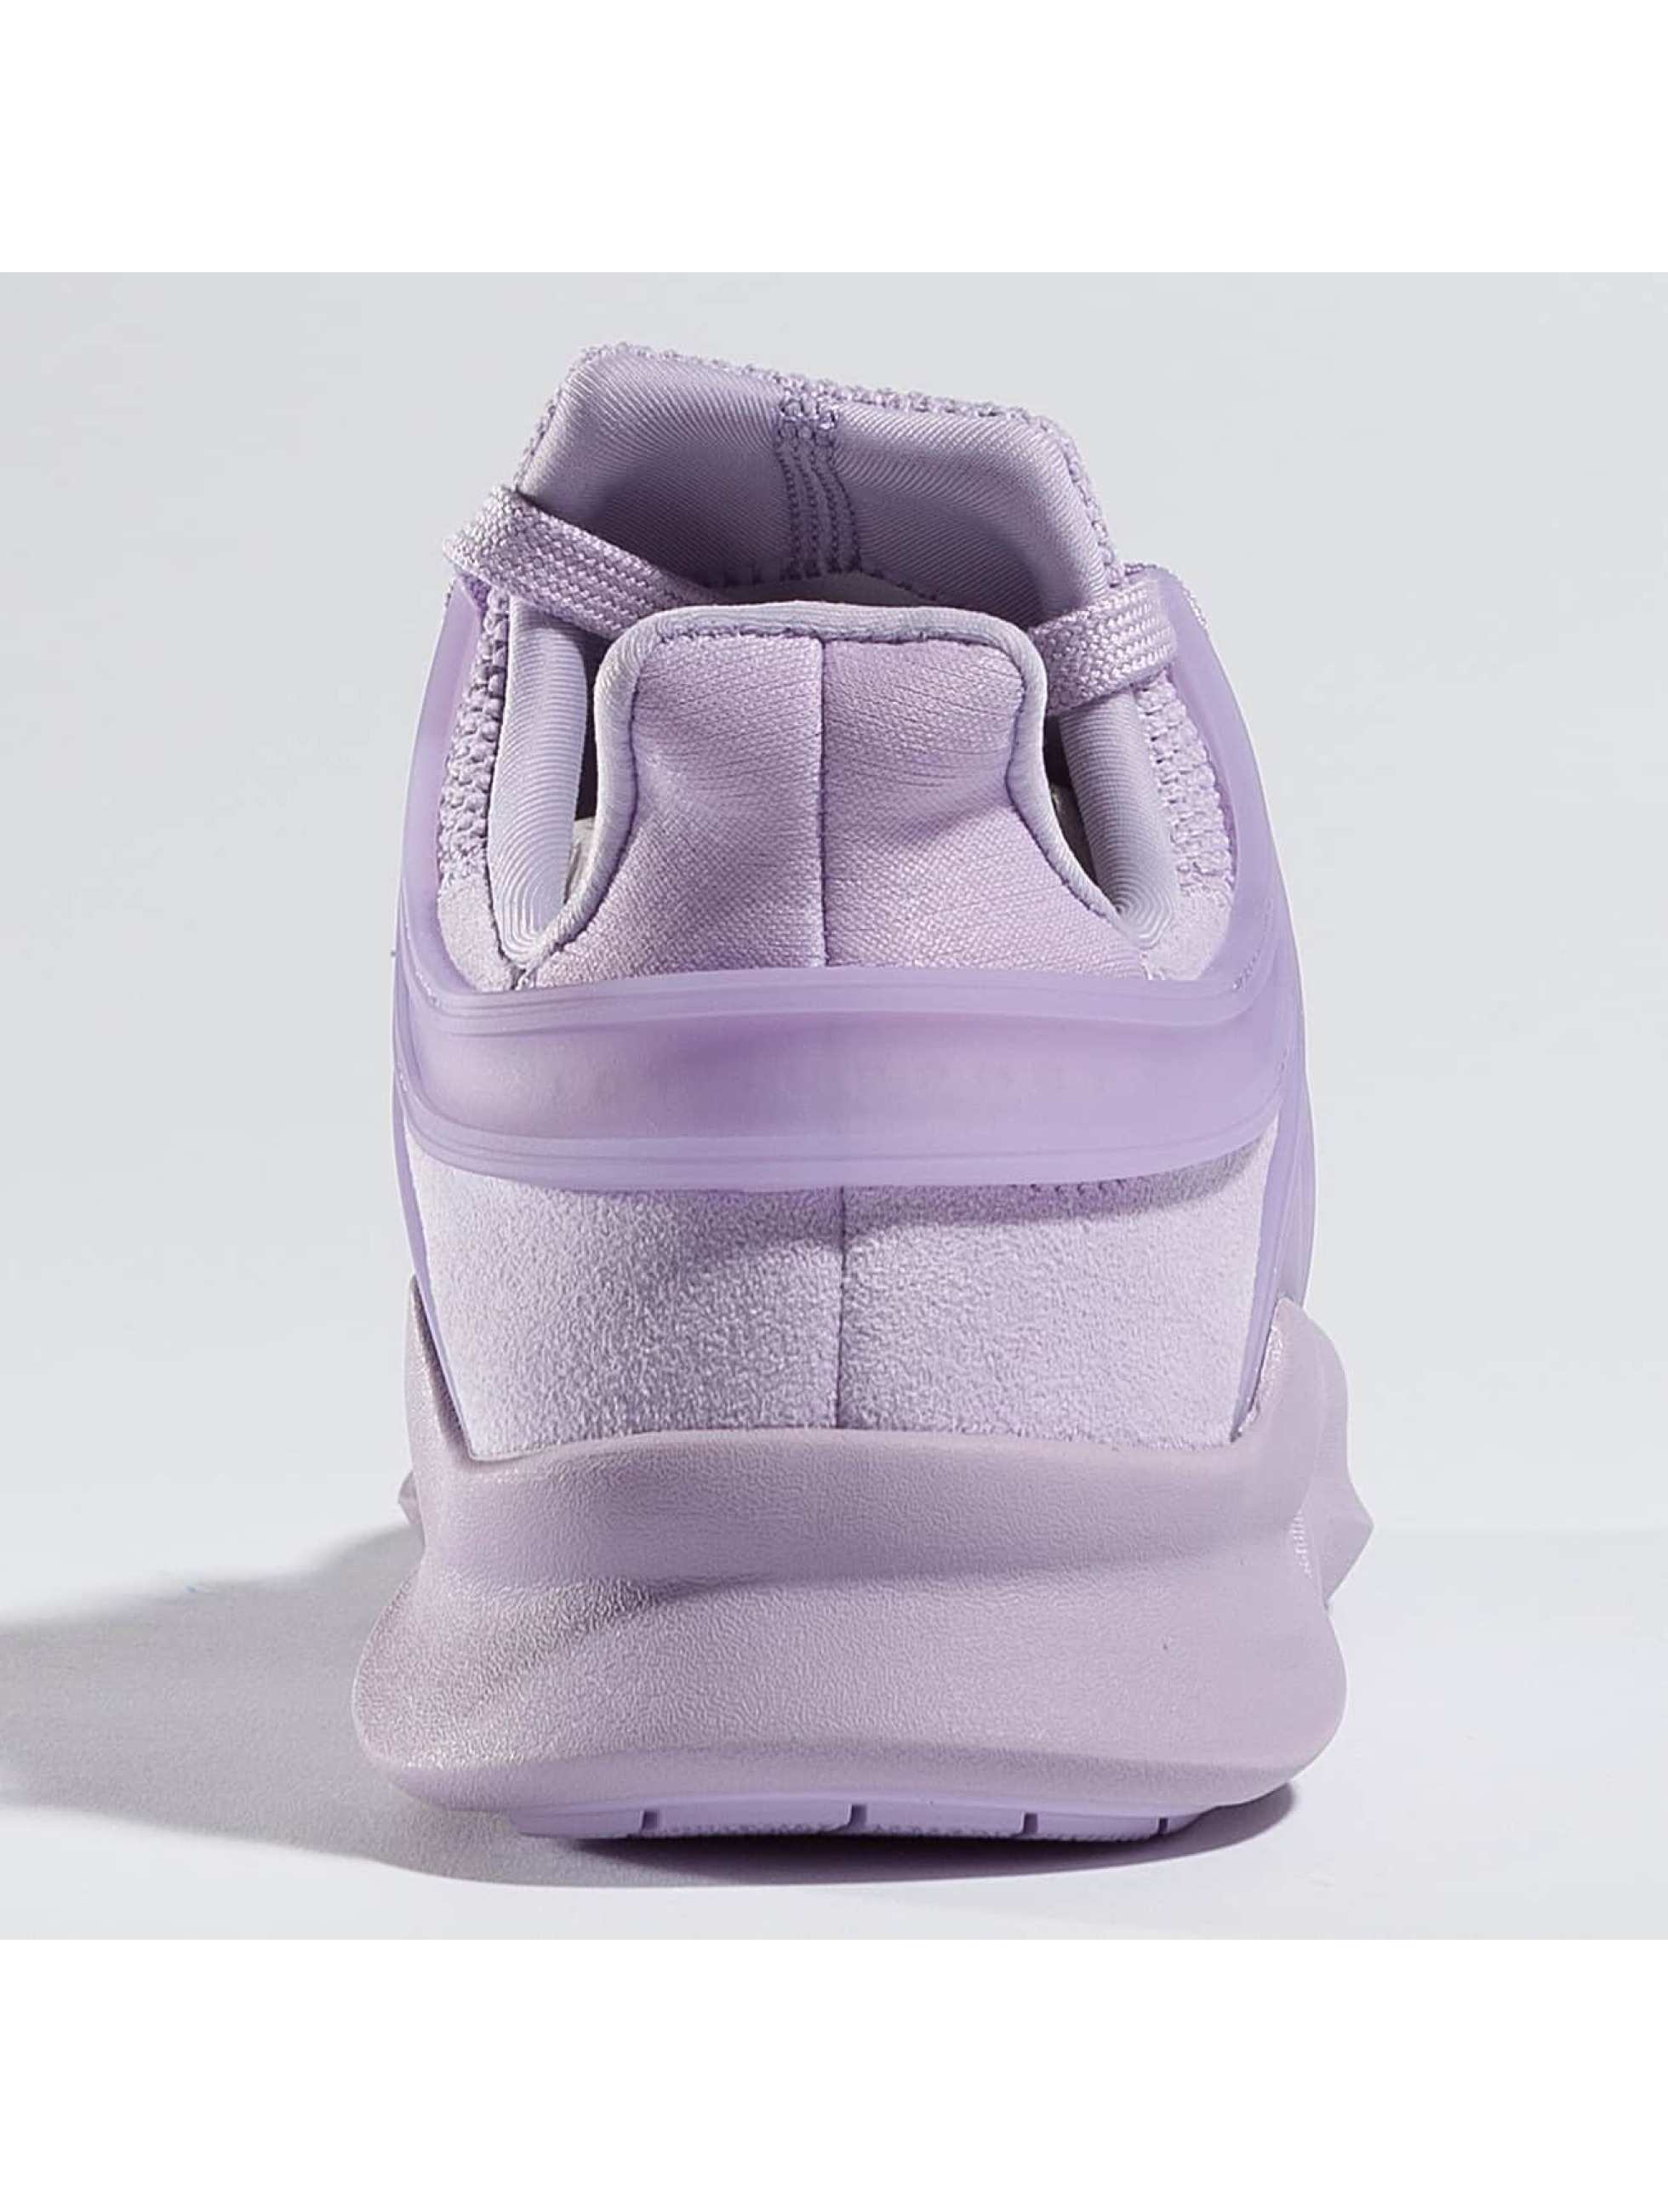 adidas Zapatillas de deporte Equipment Support ADV púrpura